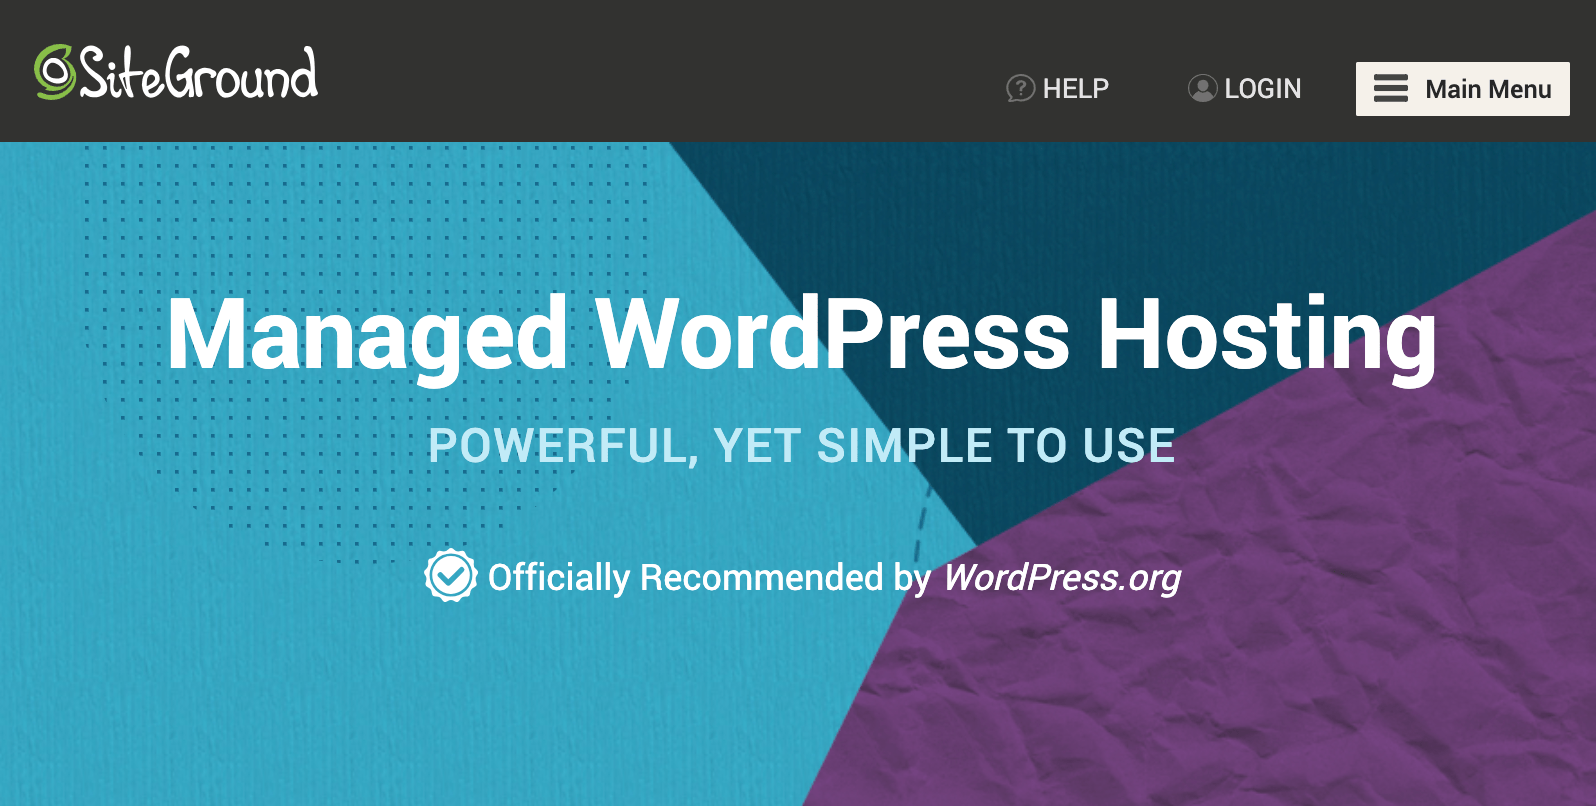 siteground-managed wordpress hosting